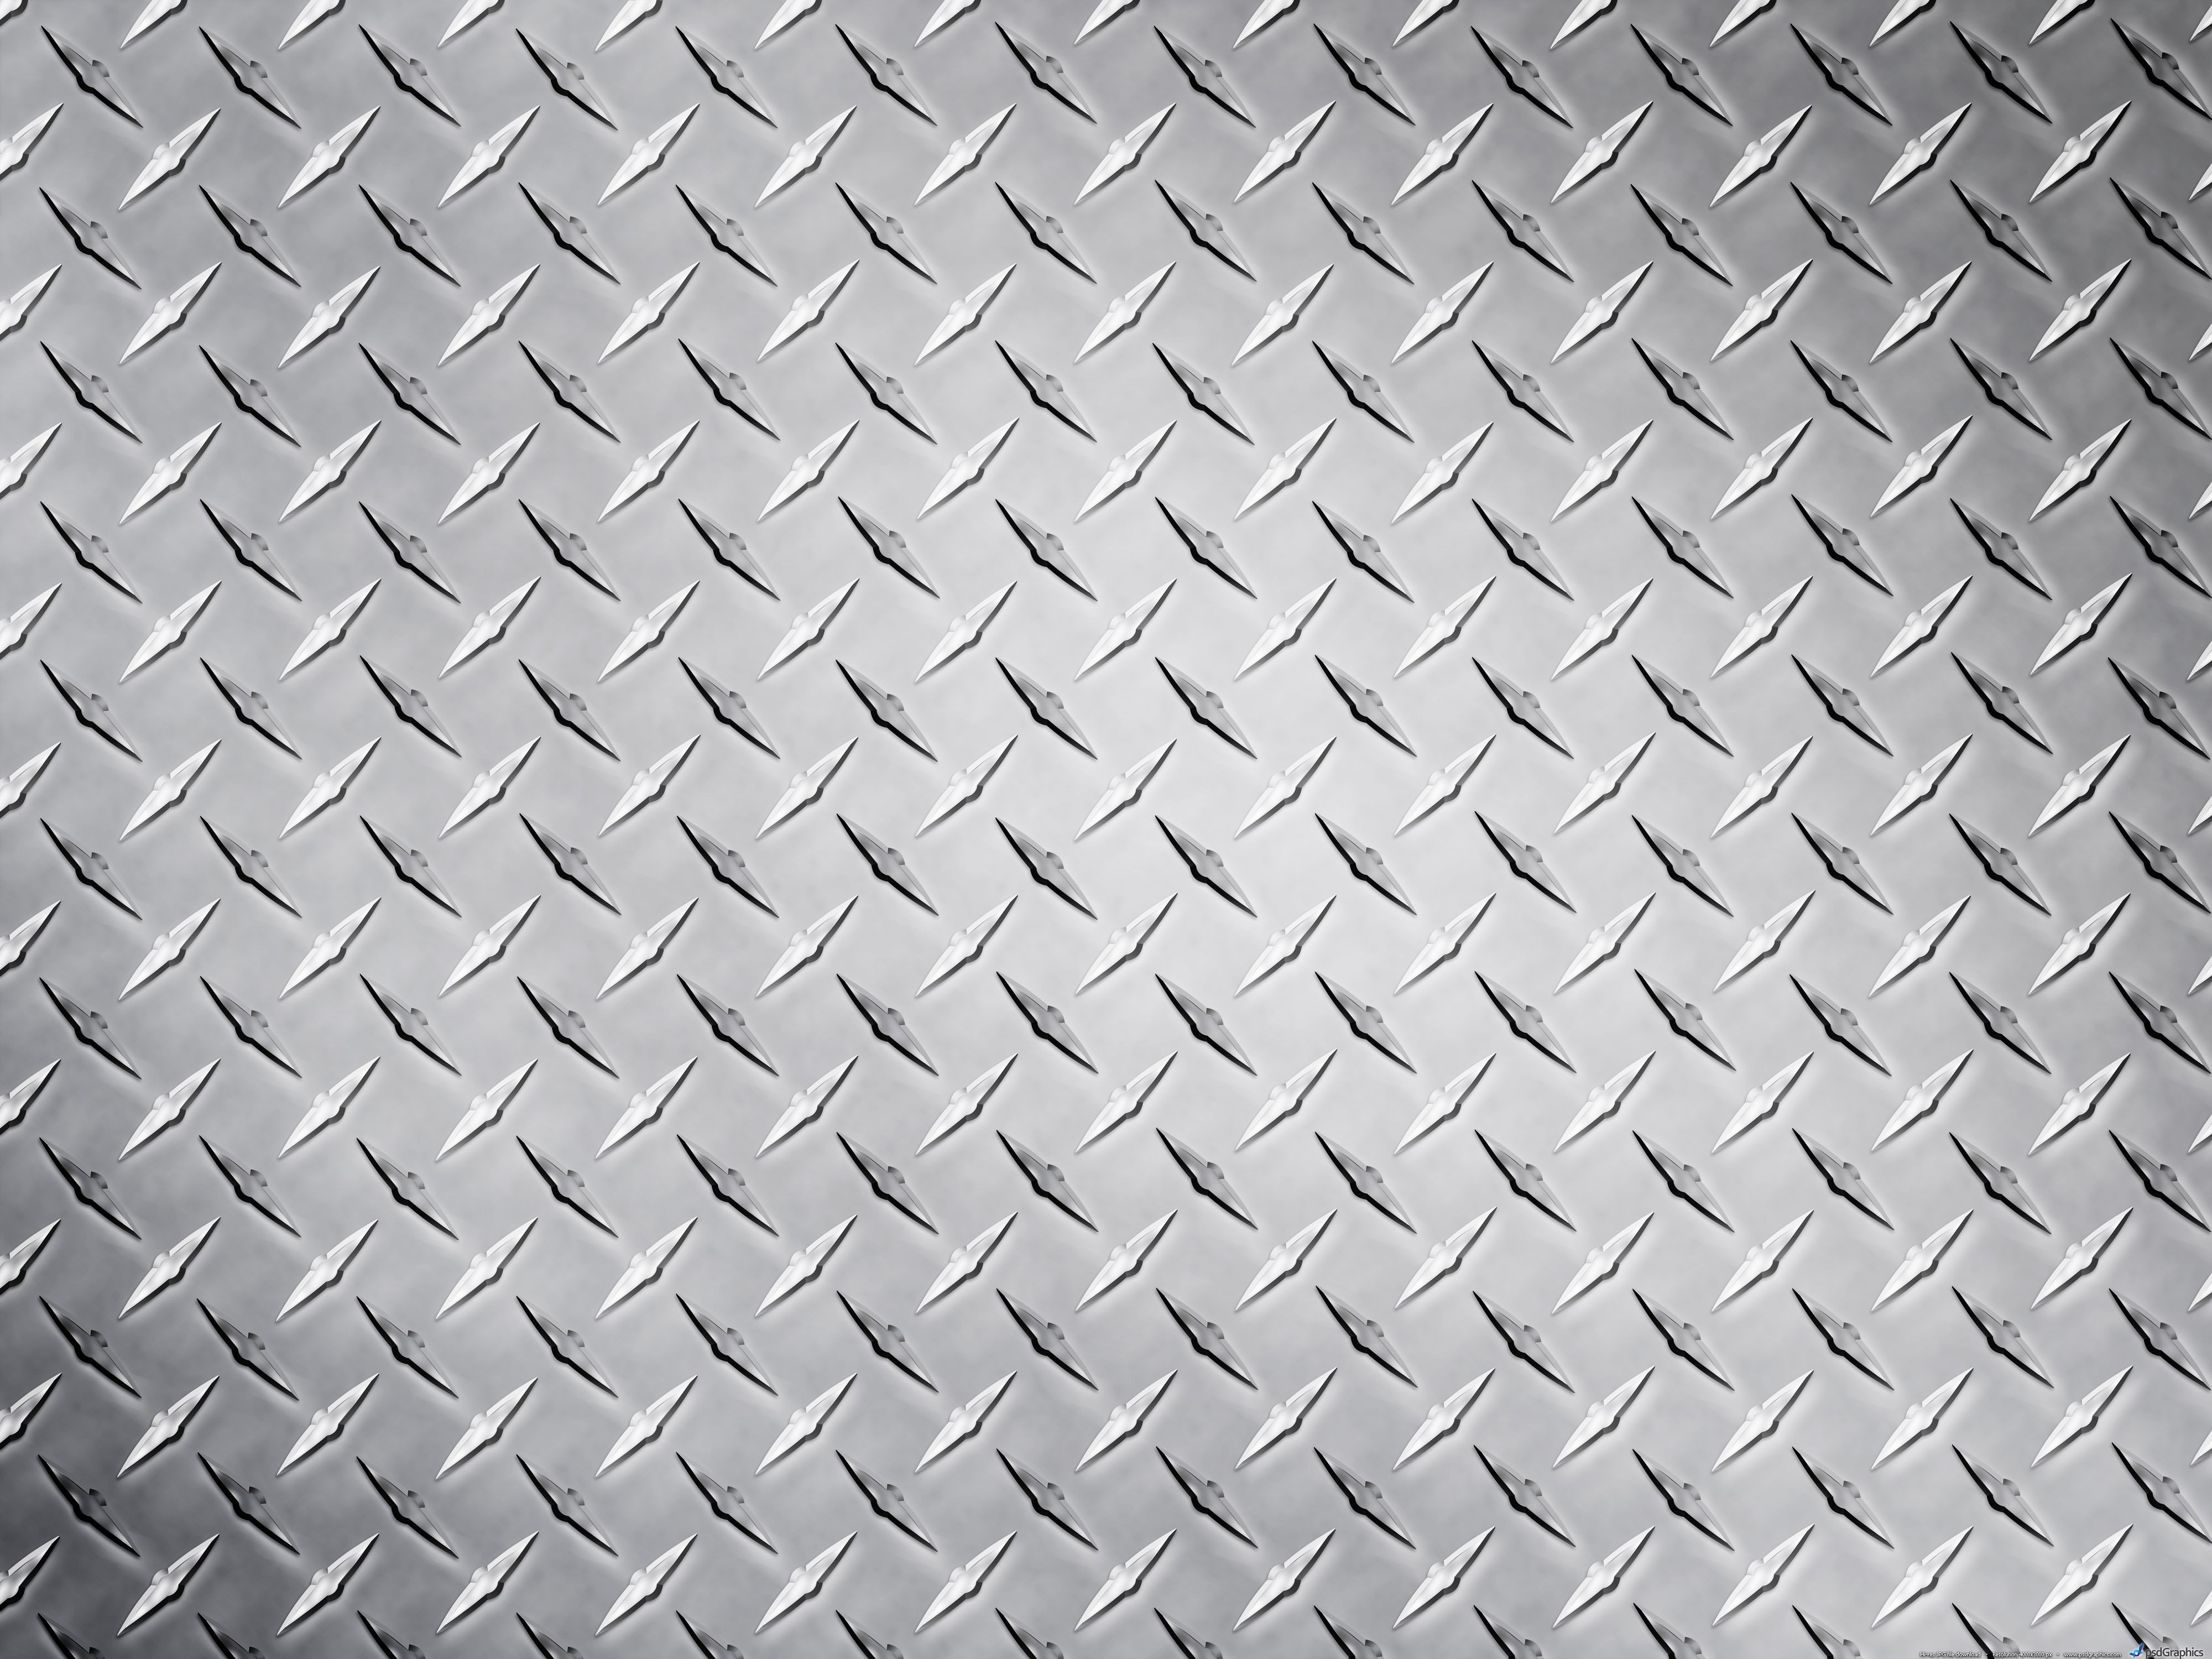 Metal diamond plate texture PSDGraphics 4000x3000